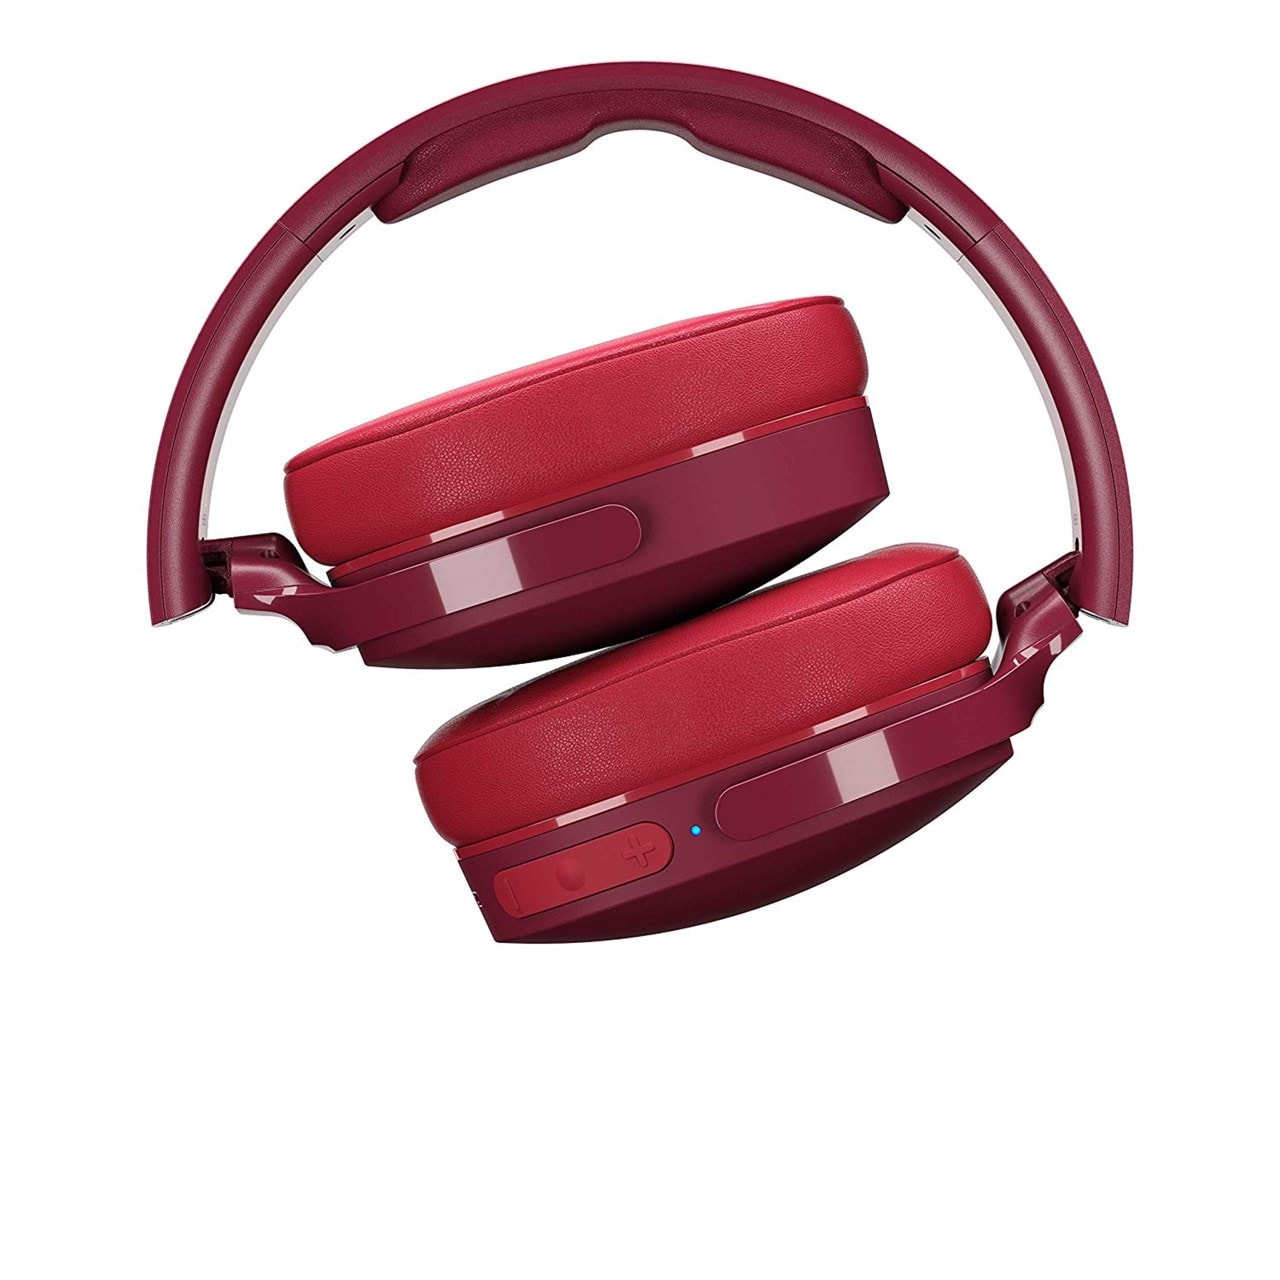 Skullcandy Hesh 3 Moab Red Bluetooth Headphones - 3